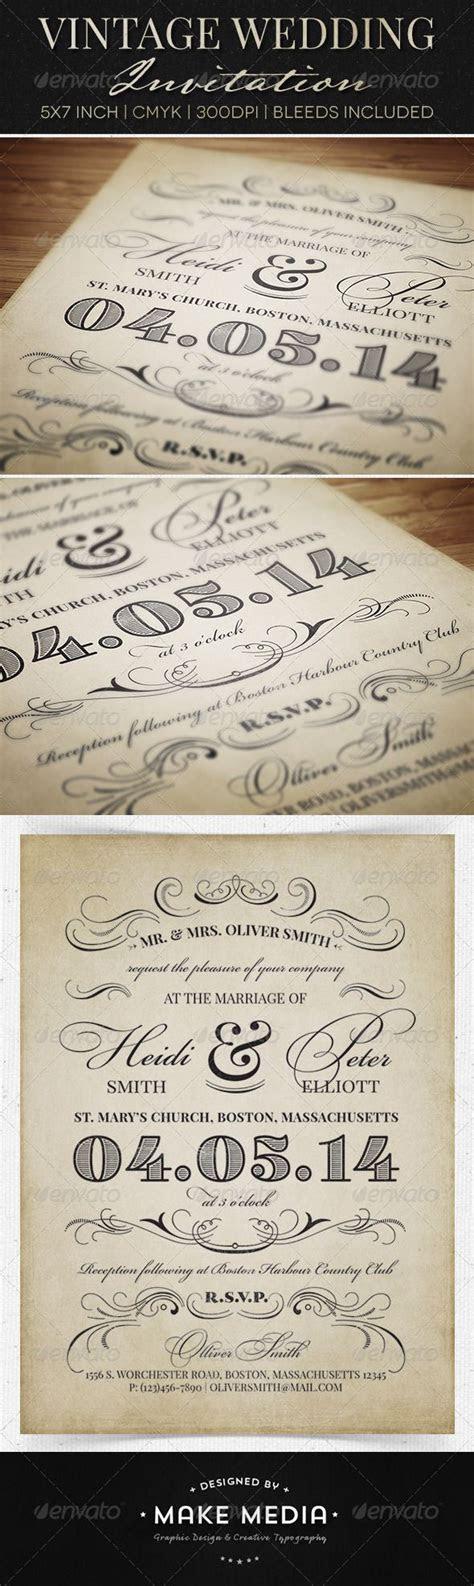 25  best ideas about Vintage wedding invitations on